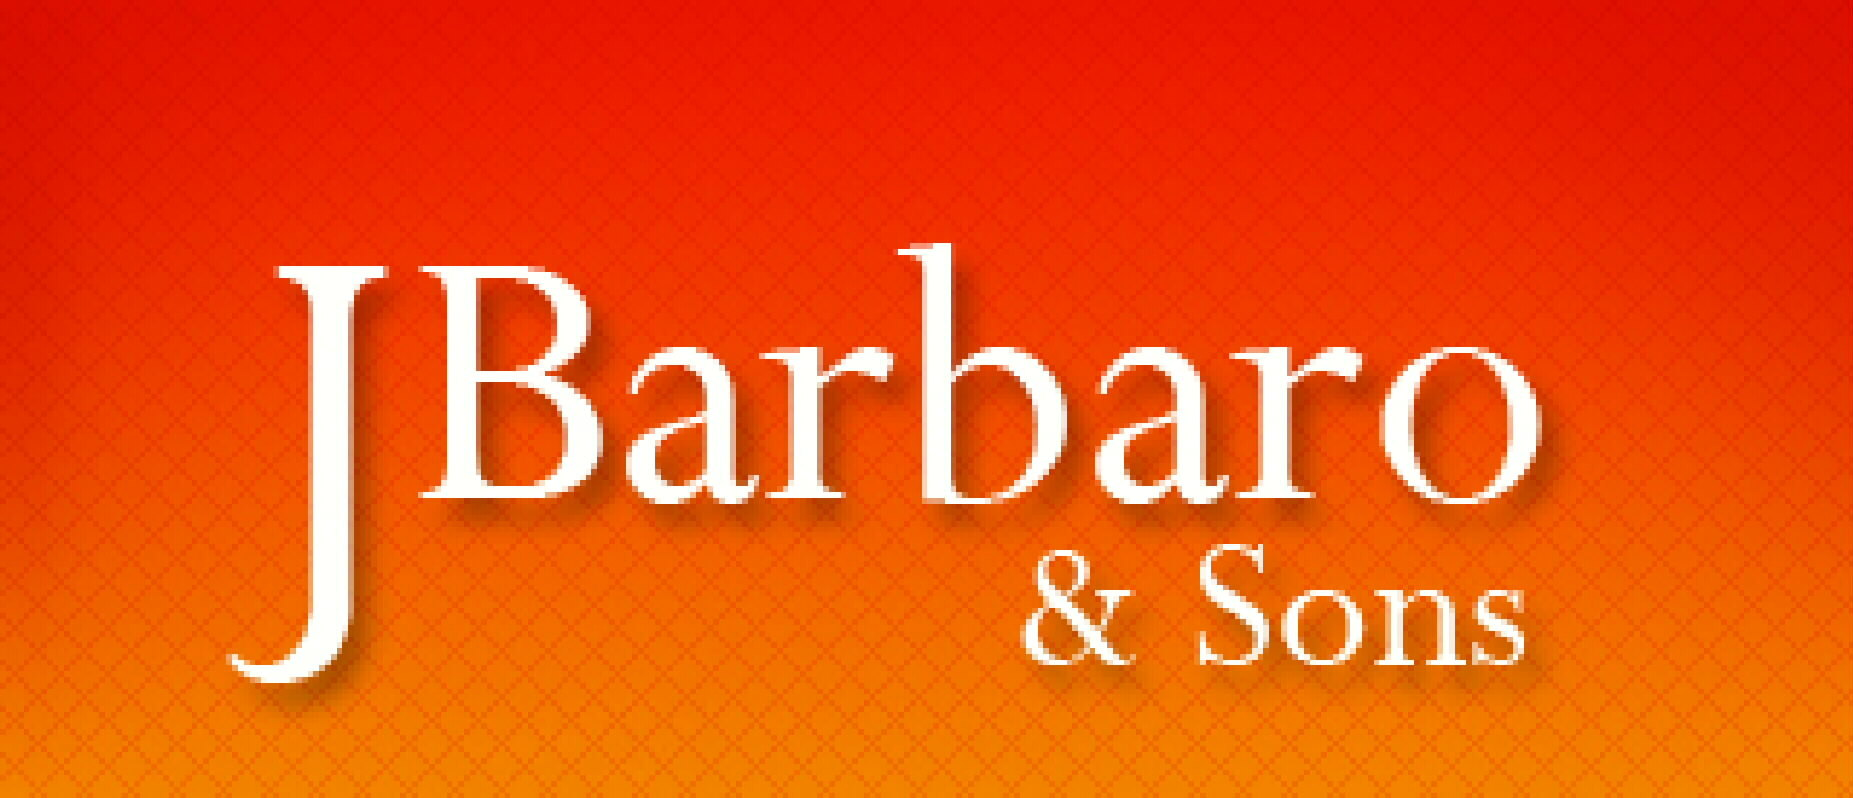 JBarbaro & Sons